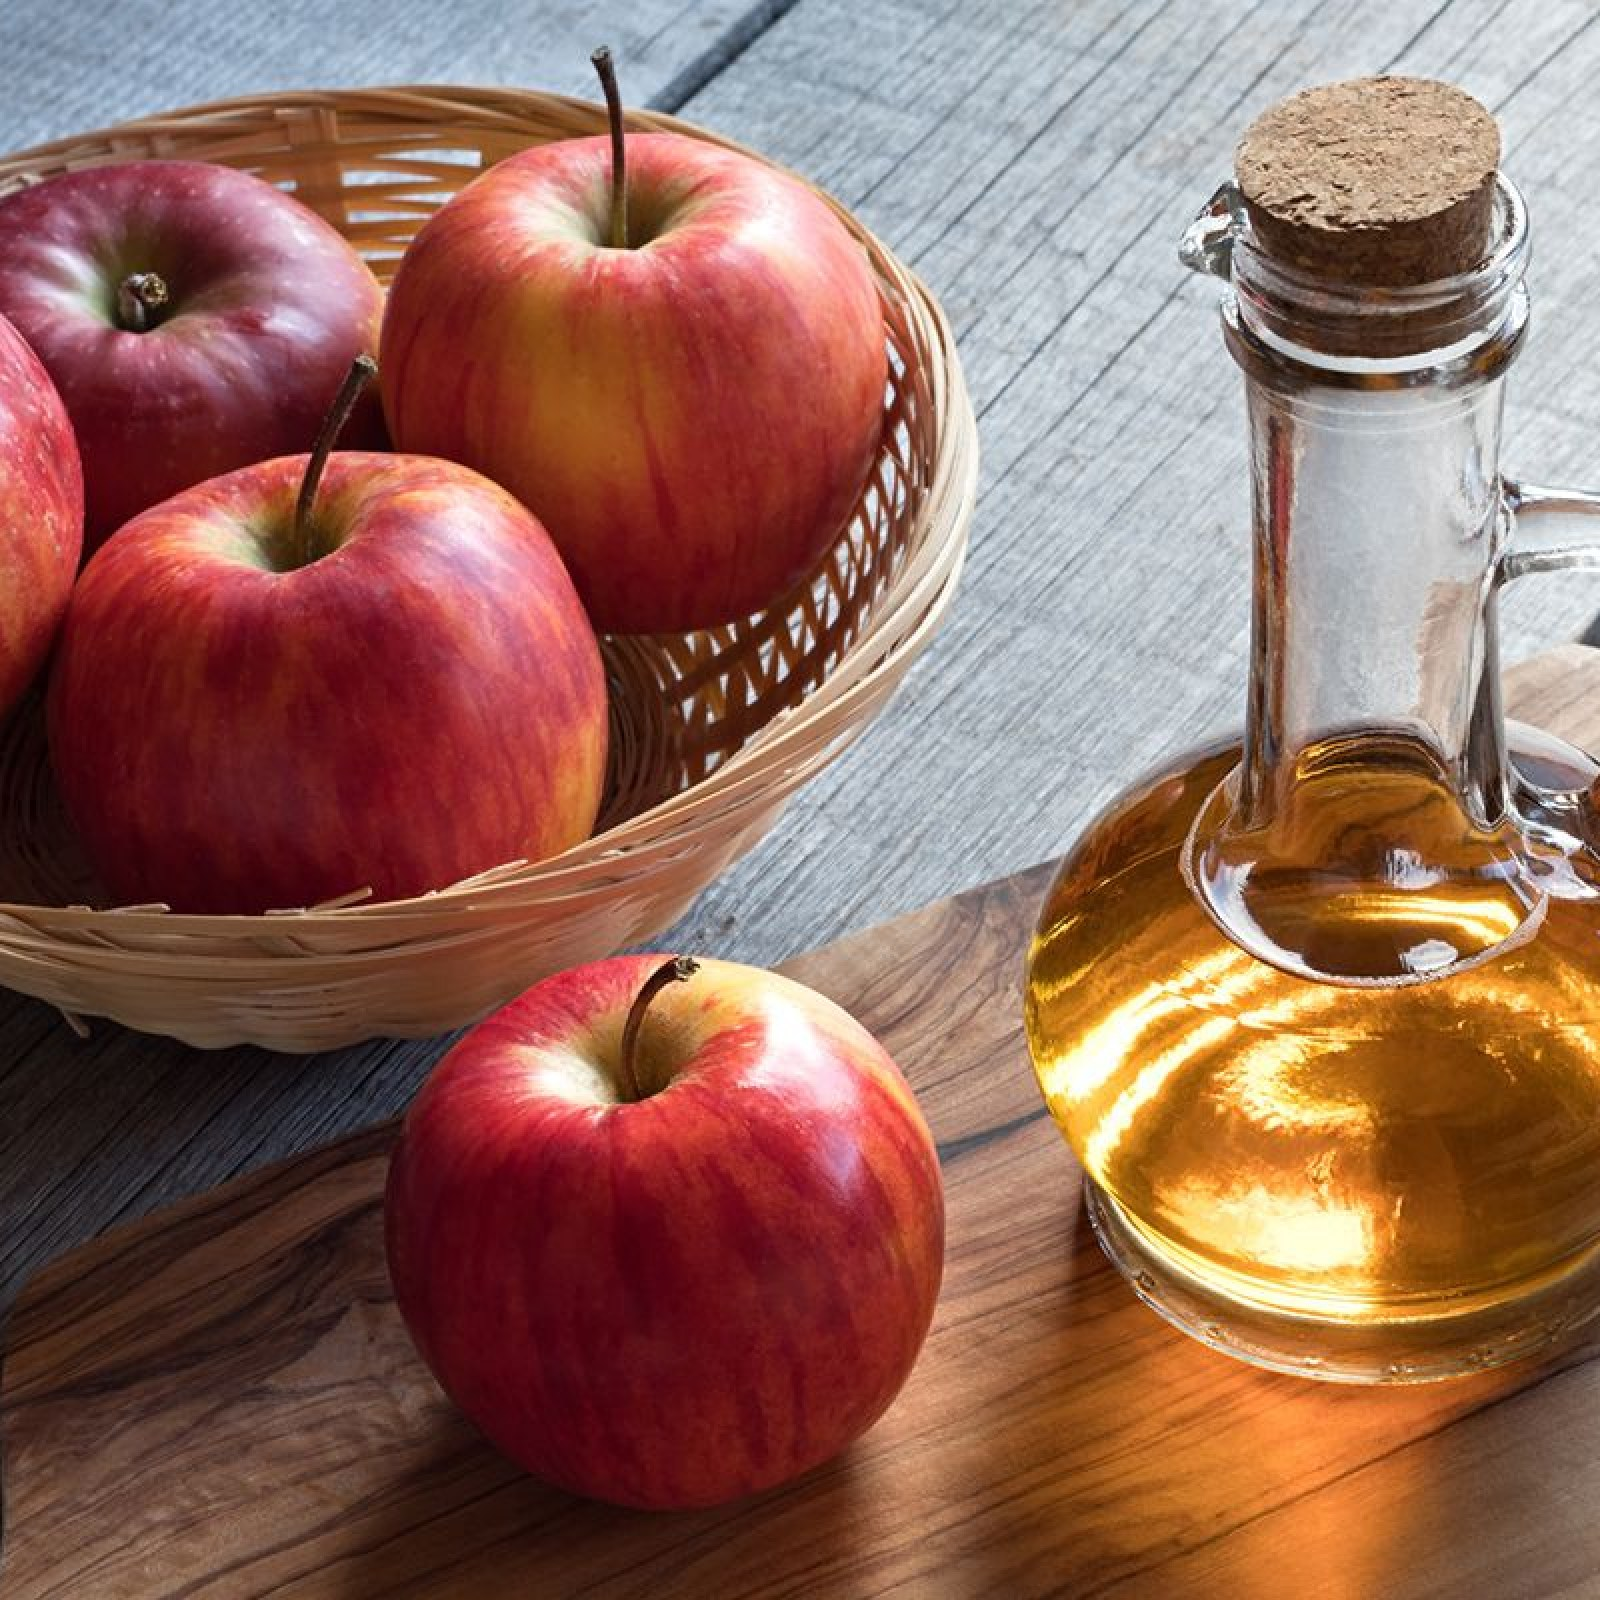 9 Surprising Apple Cider Vinegar Uses and Health Benefits